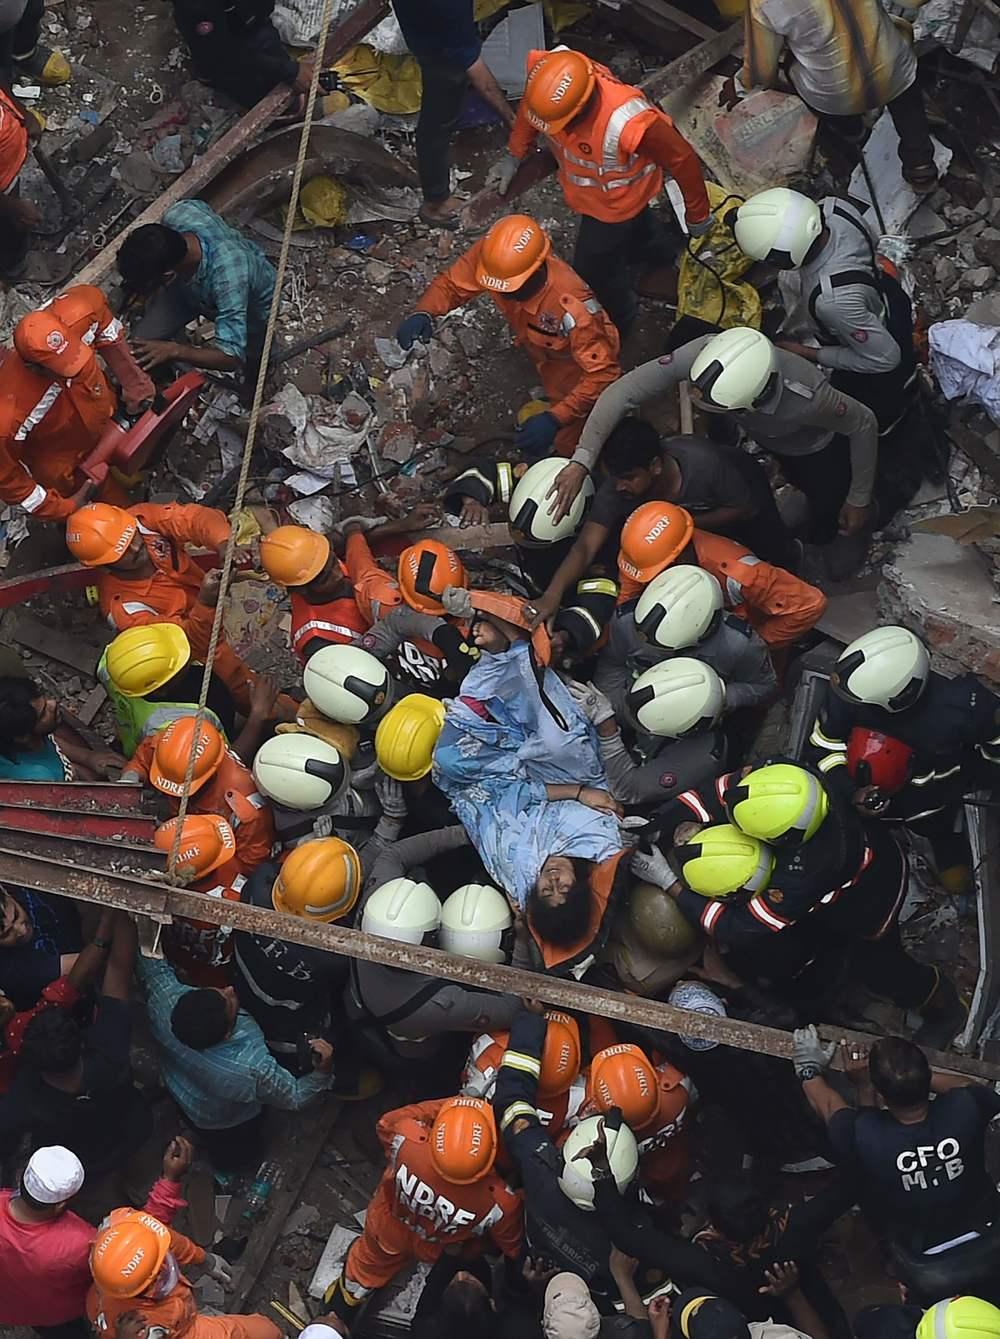 Woman rescued in Mumbai rubble